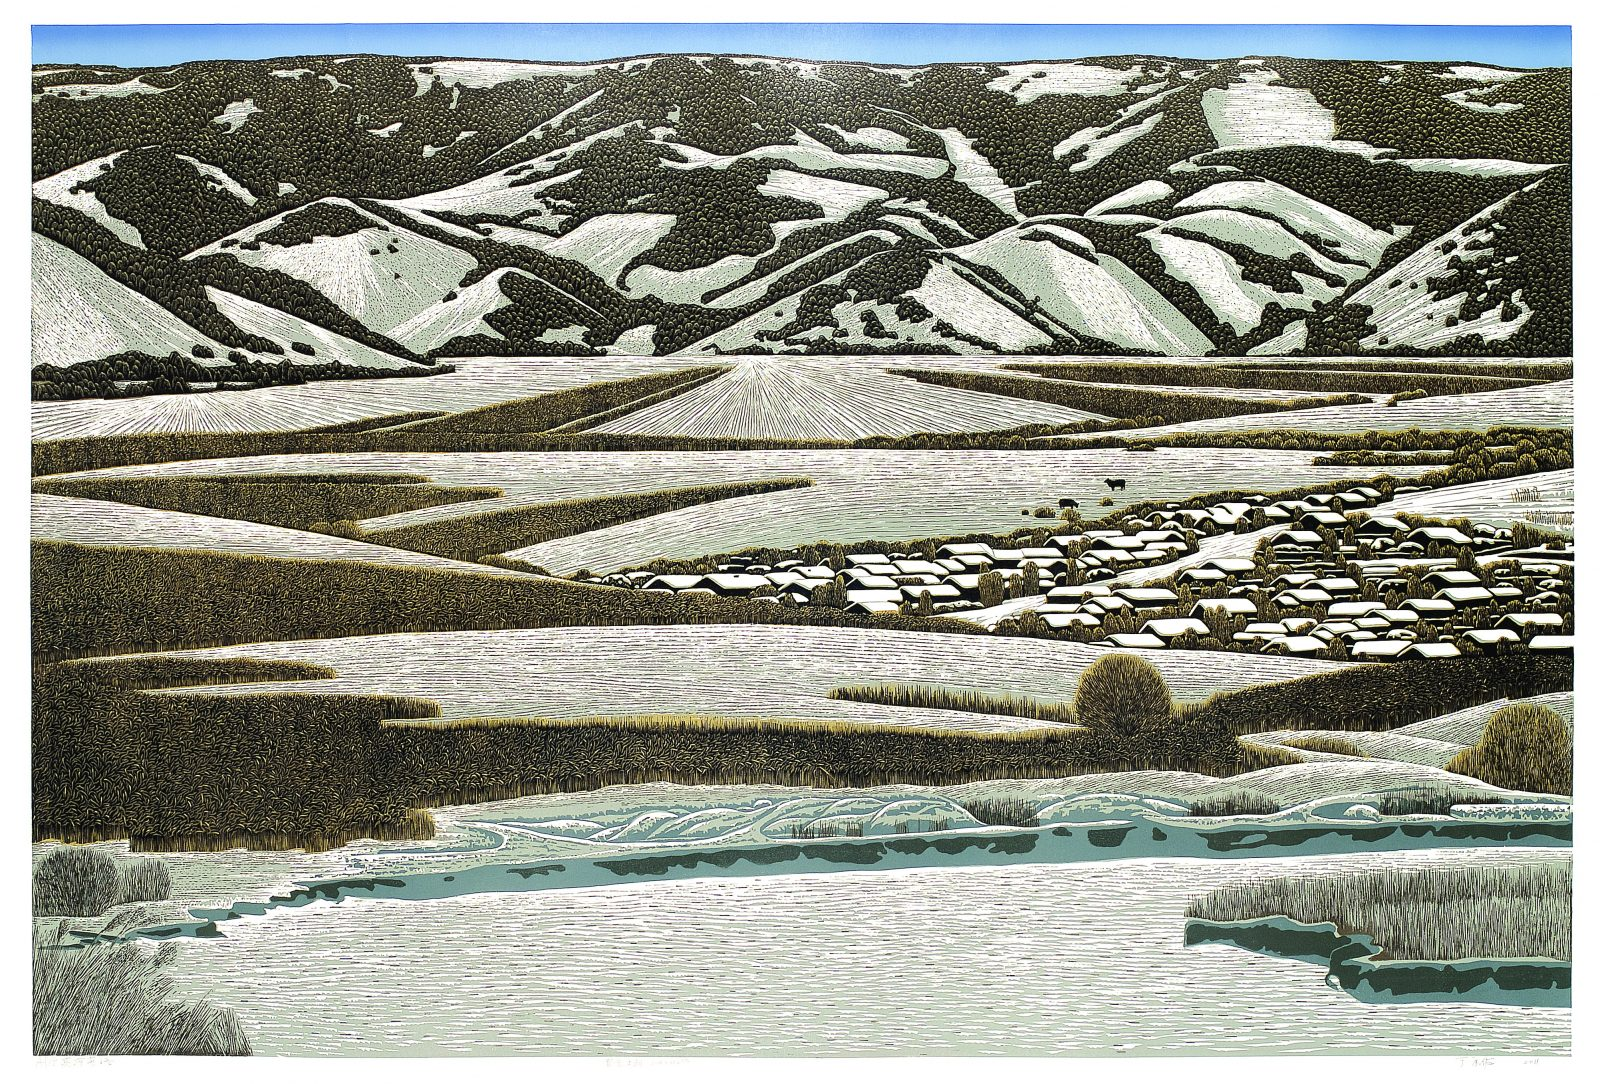 Winter in the Lianghe Village 亮河屯之冬,100x150cm, 2011